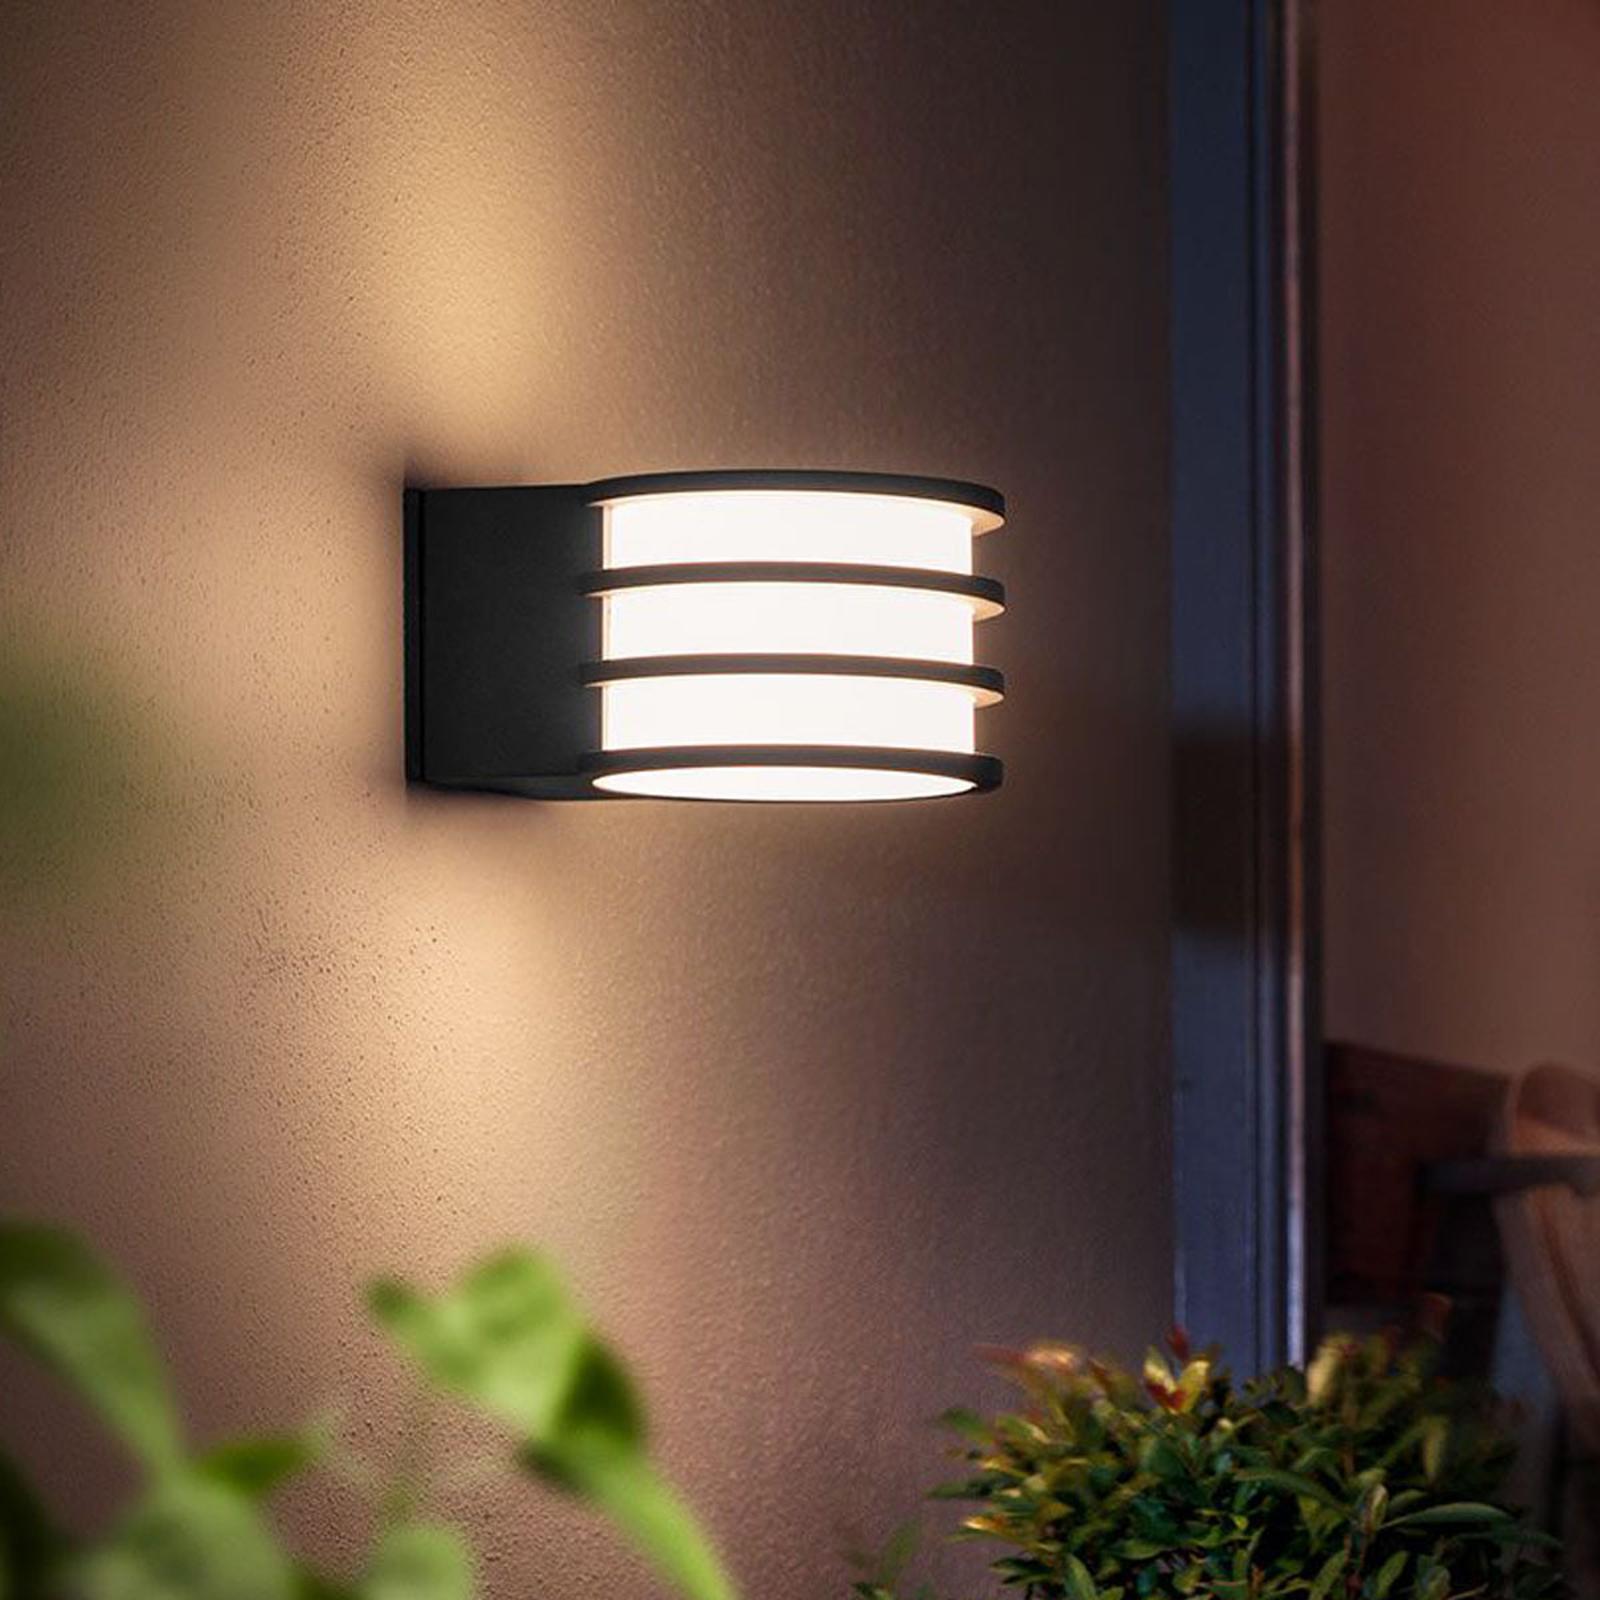 Philips Hue LED buitenwandlamp Lucca, met app